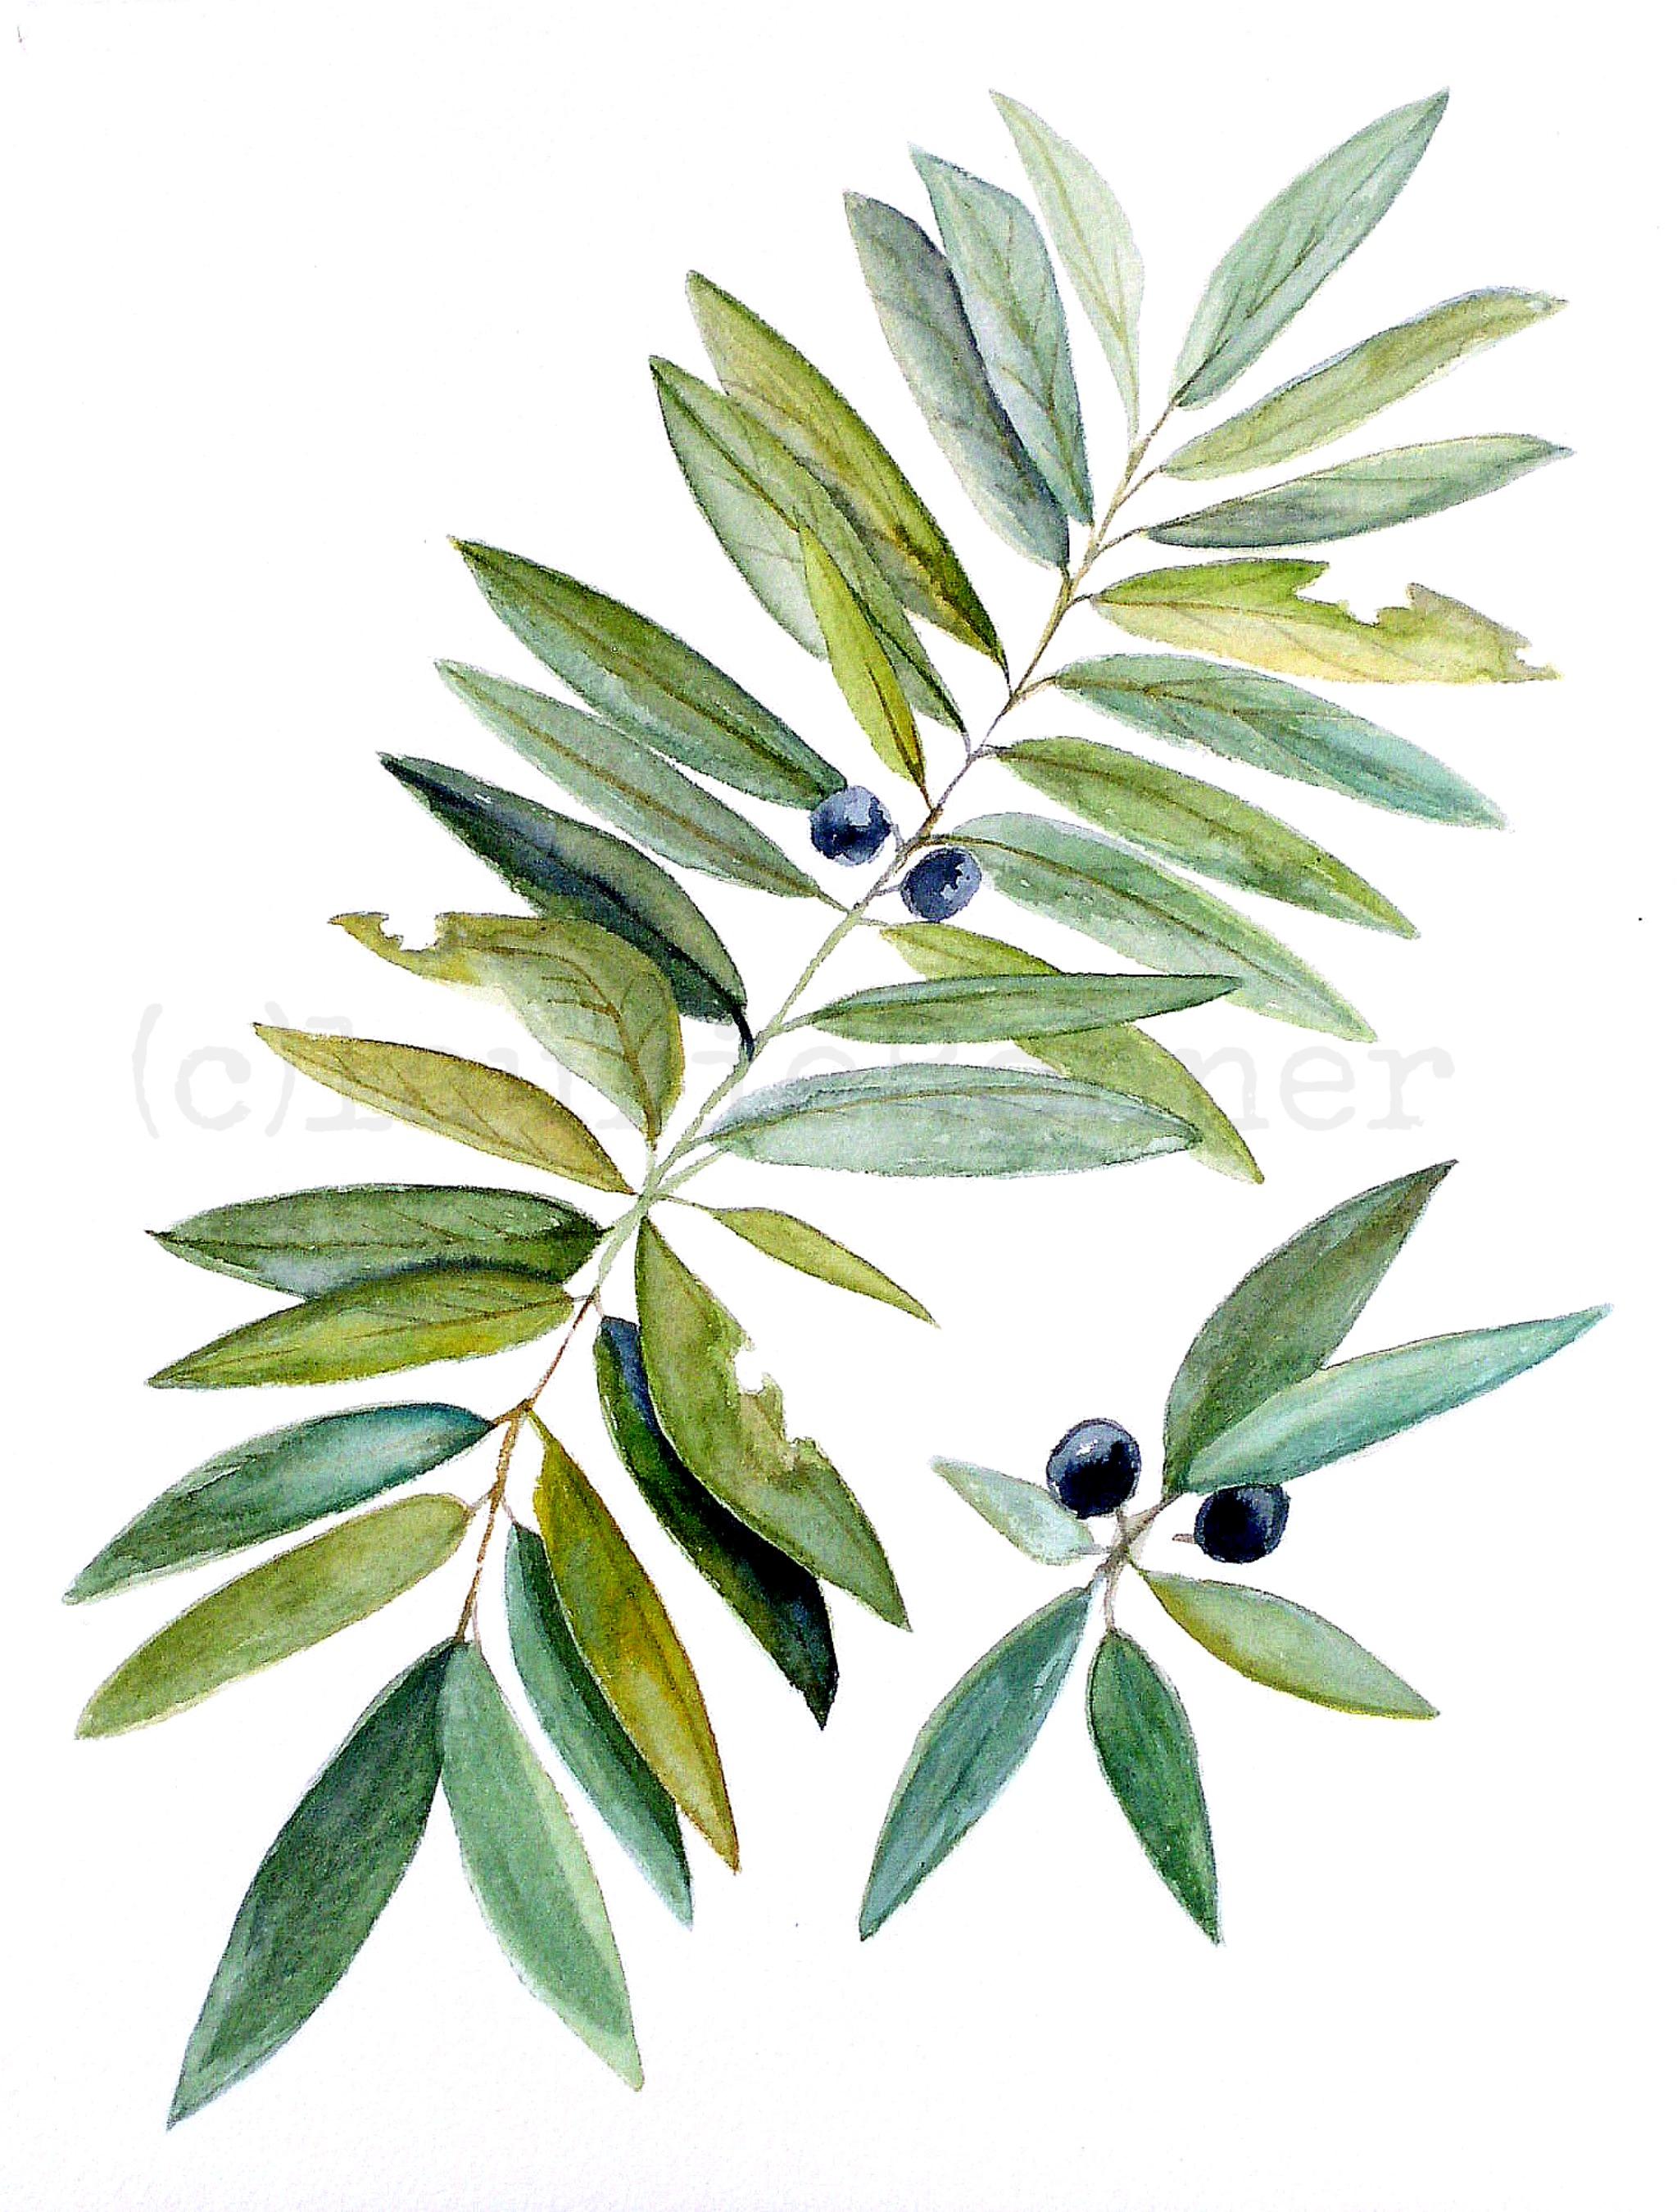 Botanical nature art leaves and berries watercolor for Watercolor greenery